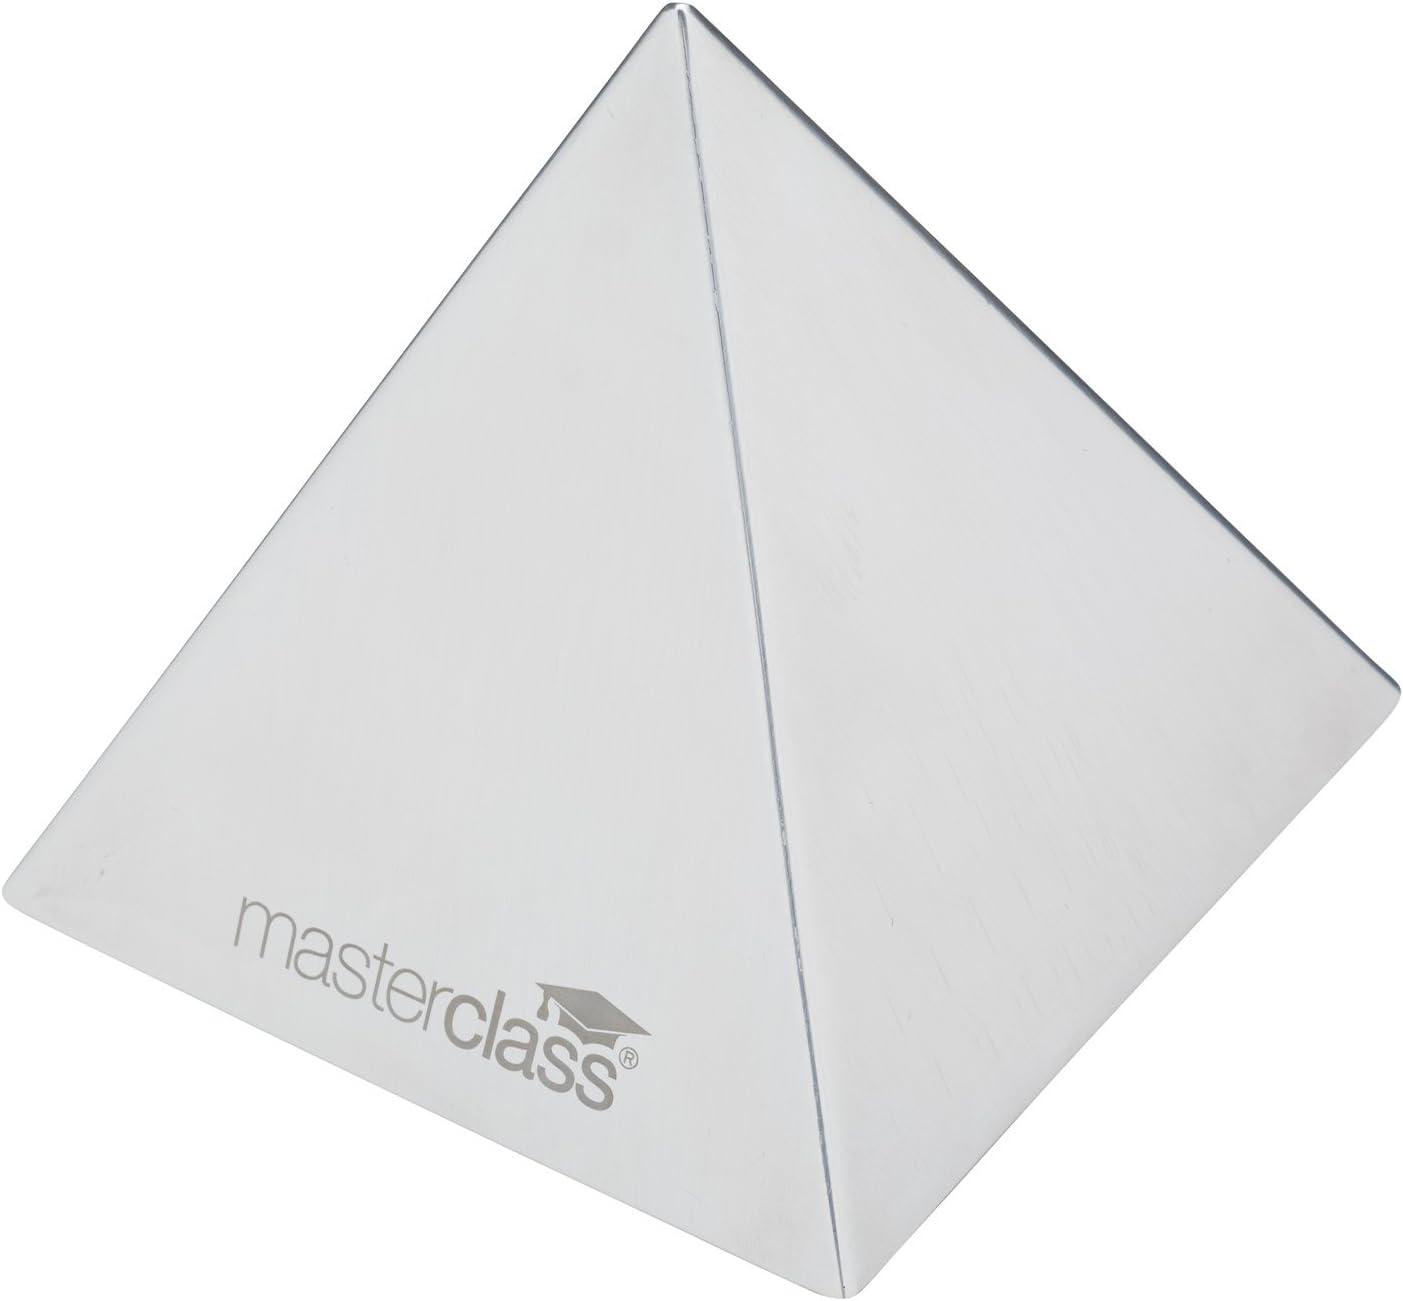 87/mm x 90/mm Vogue W724/Pyramid Moule